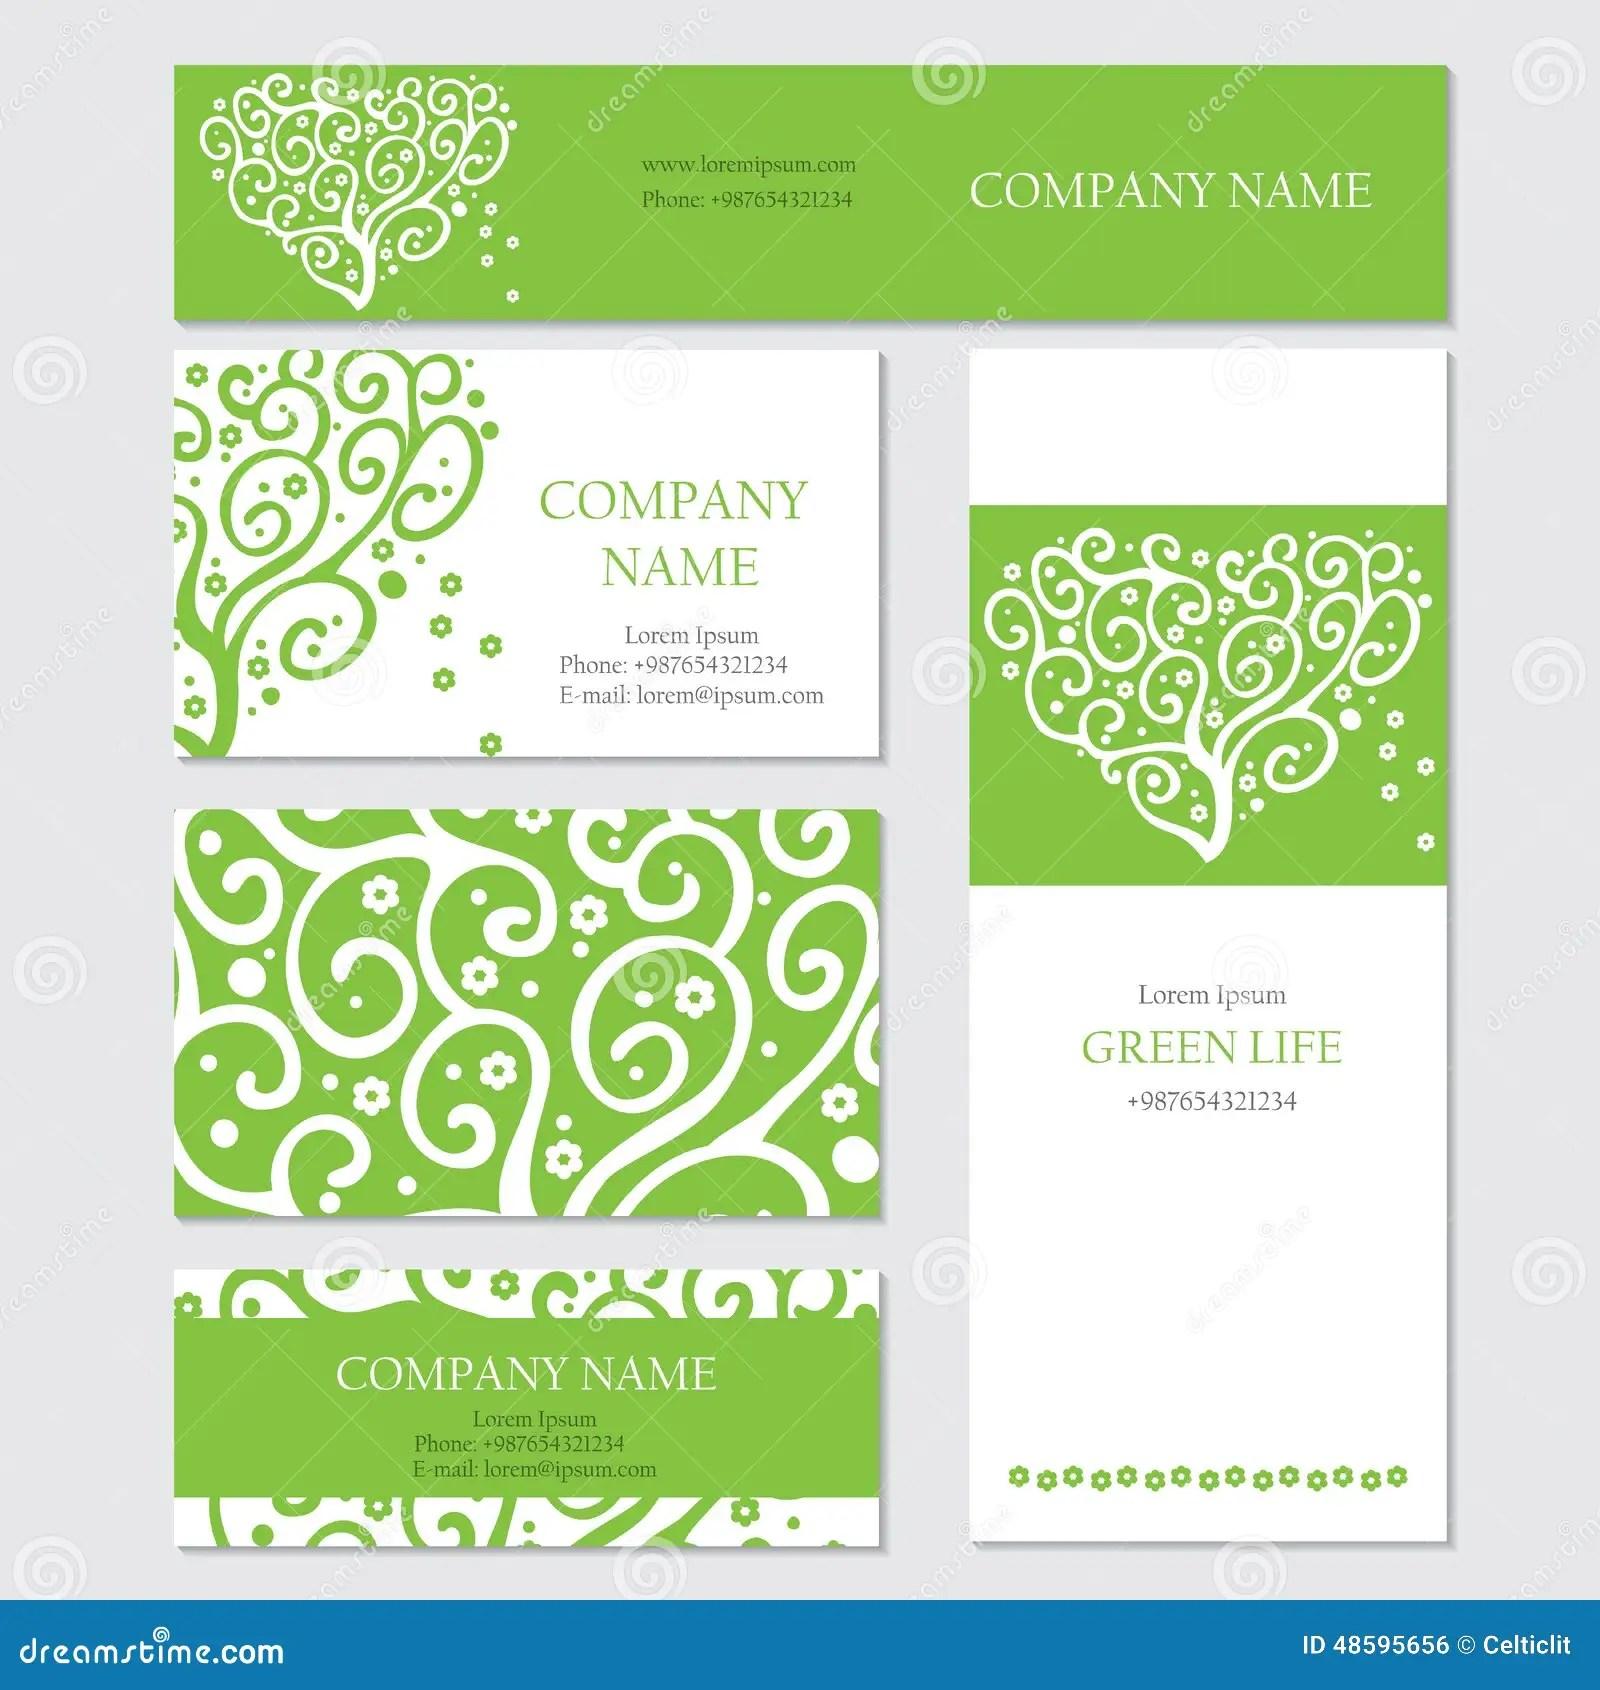 Corporate Invitation Format corporate event email invitation – Corporate Invitation Format